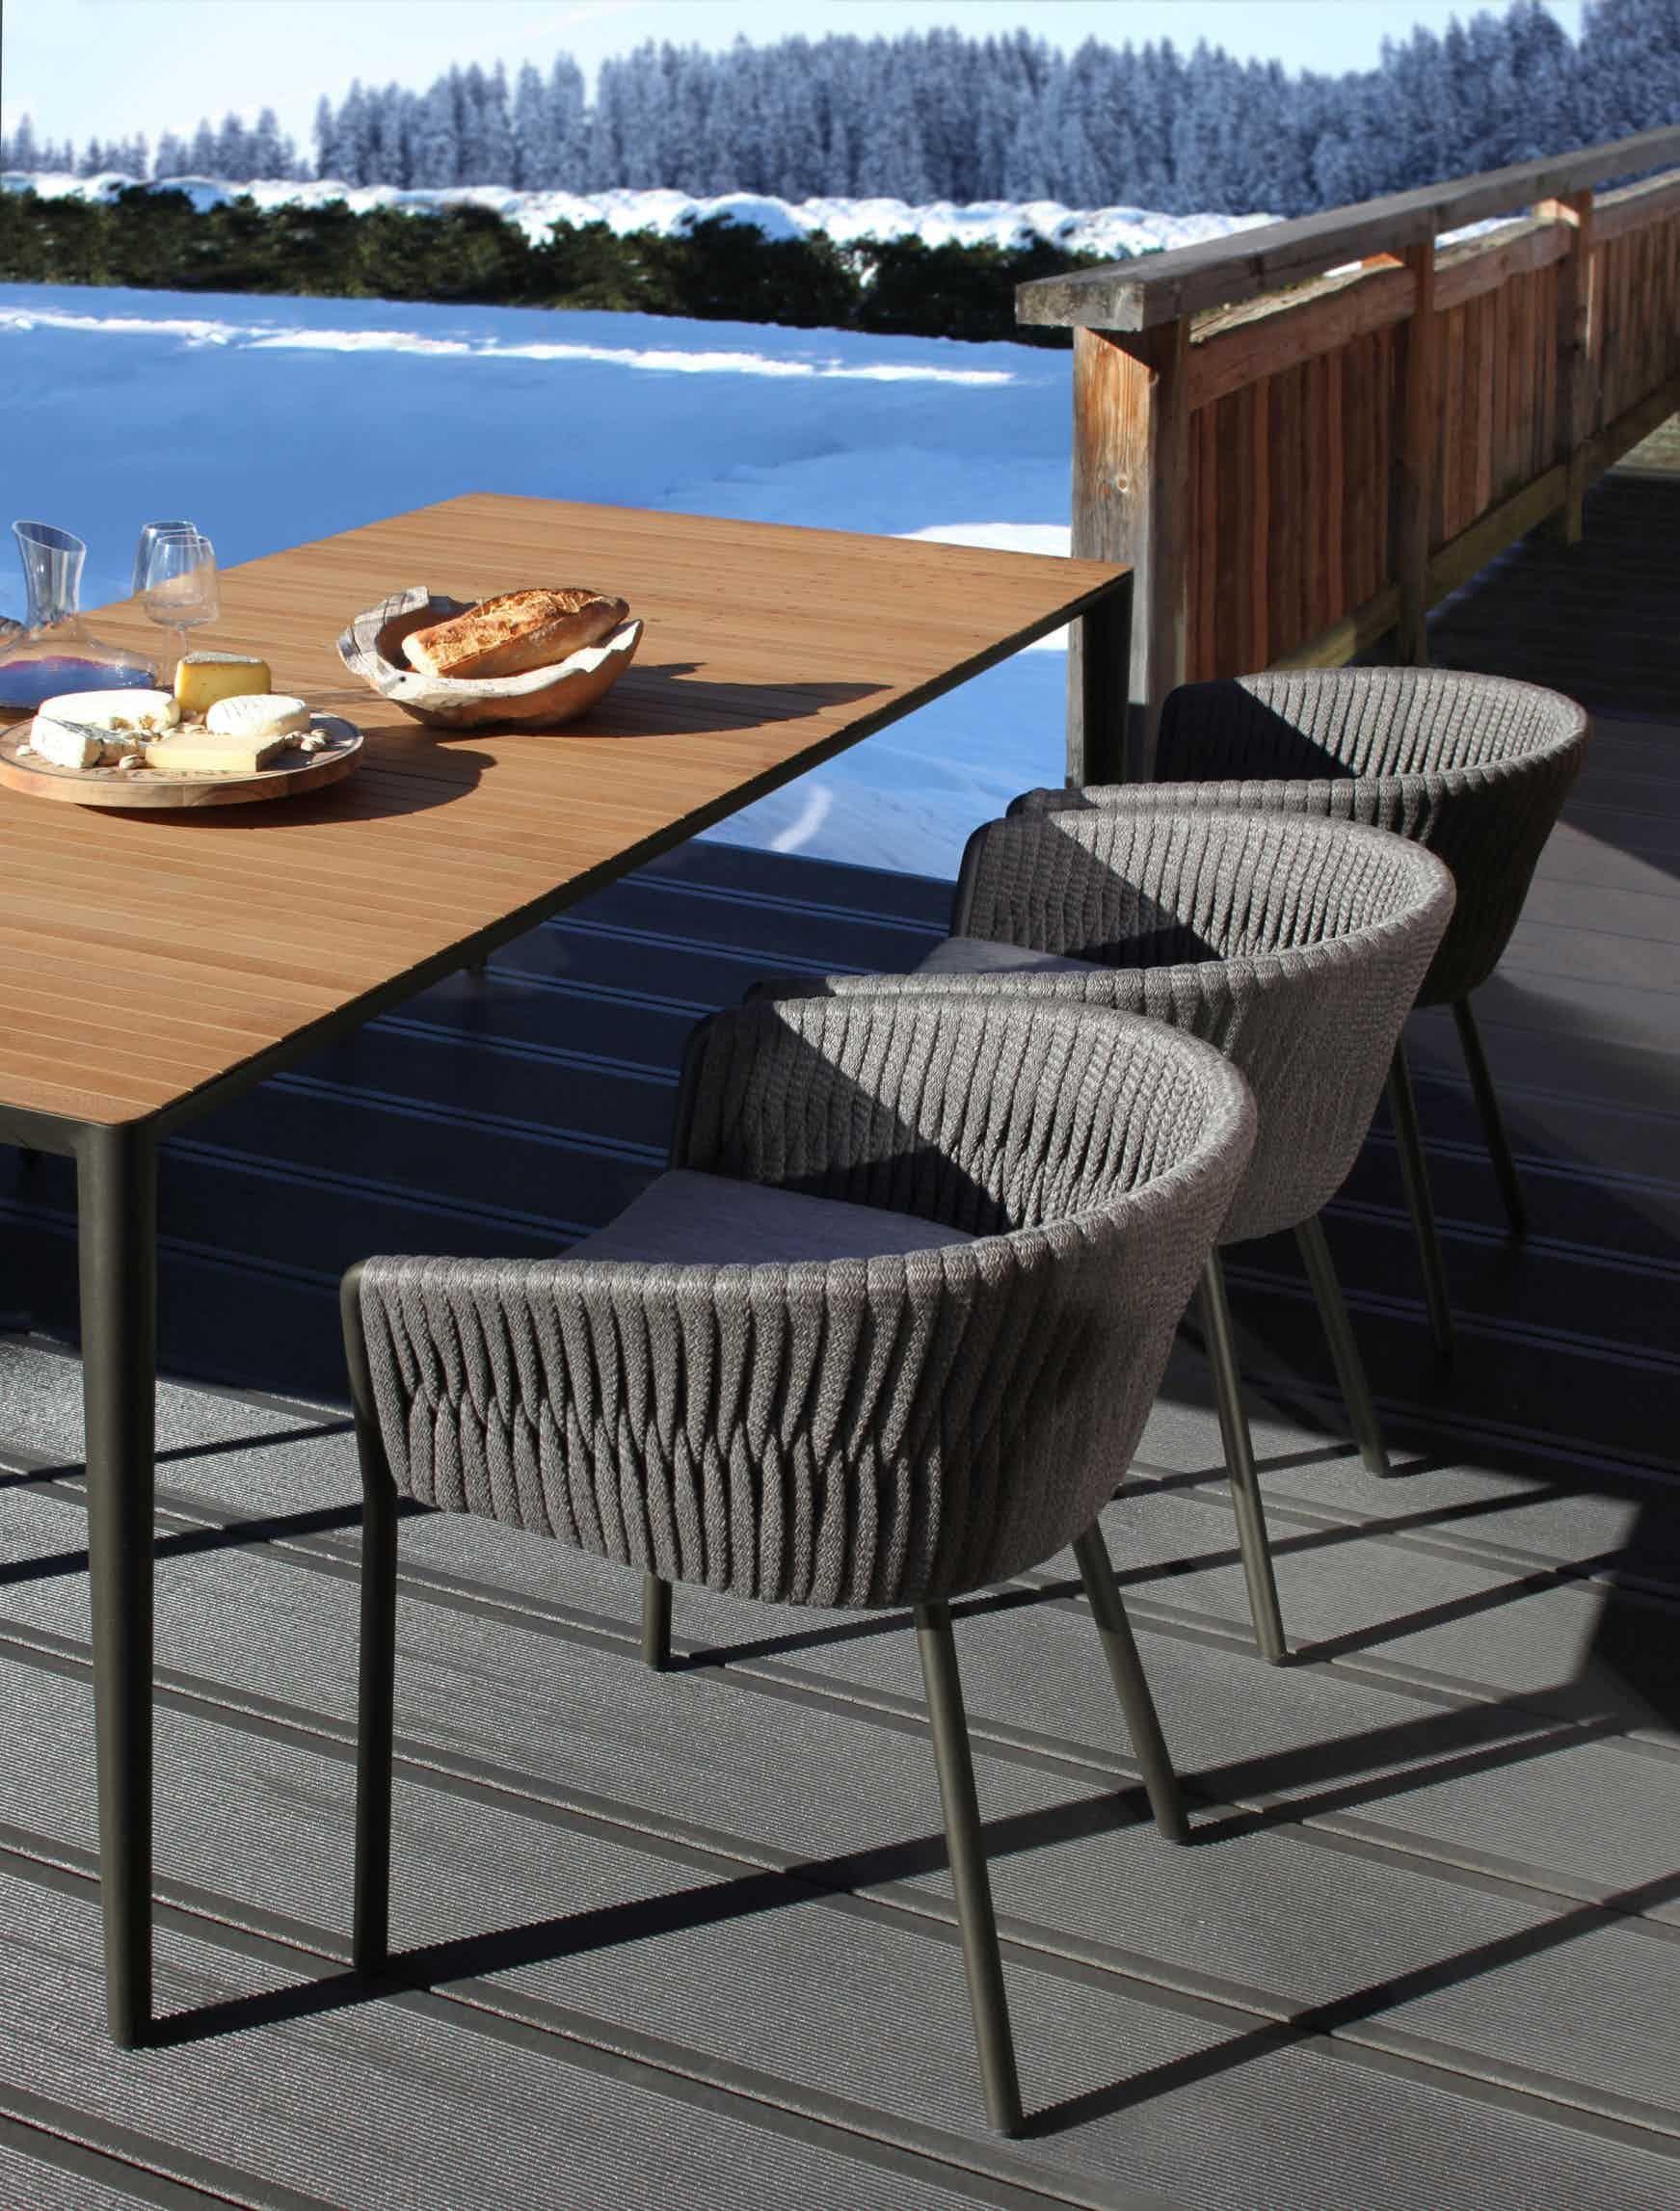 Twist Garden Chair By Royal Botania Luxury Outdoor Furniture Royal Botania Contemporary Furniture Design